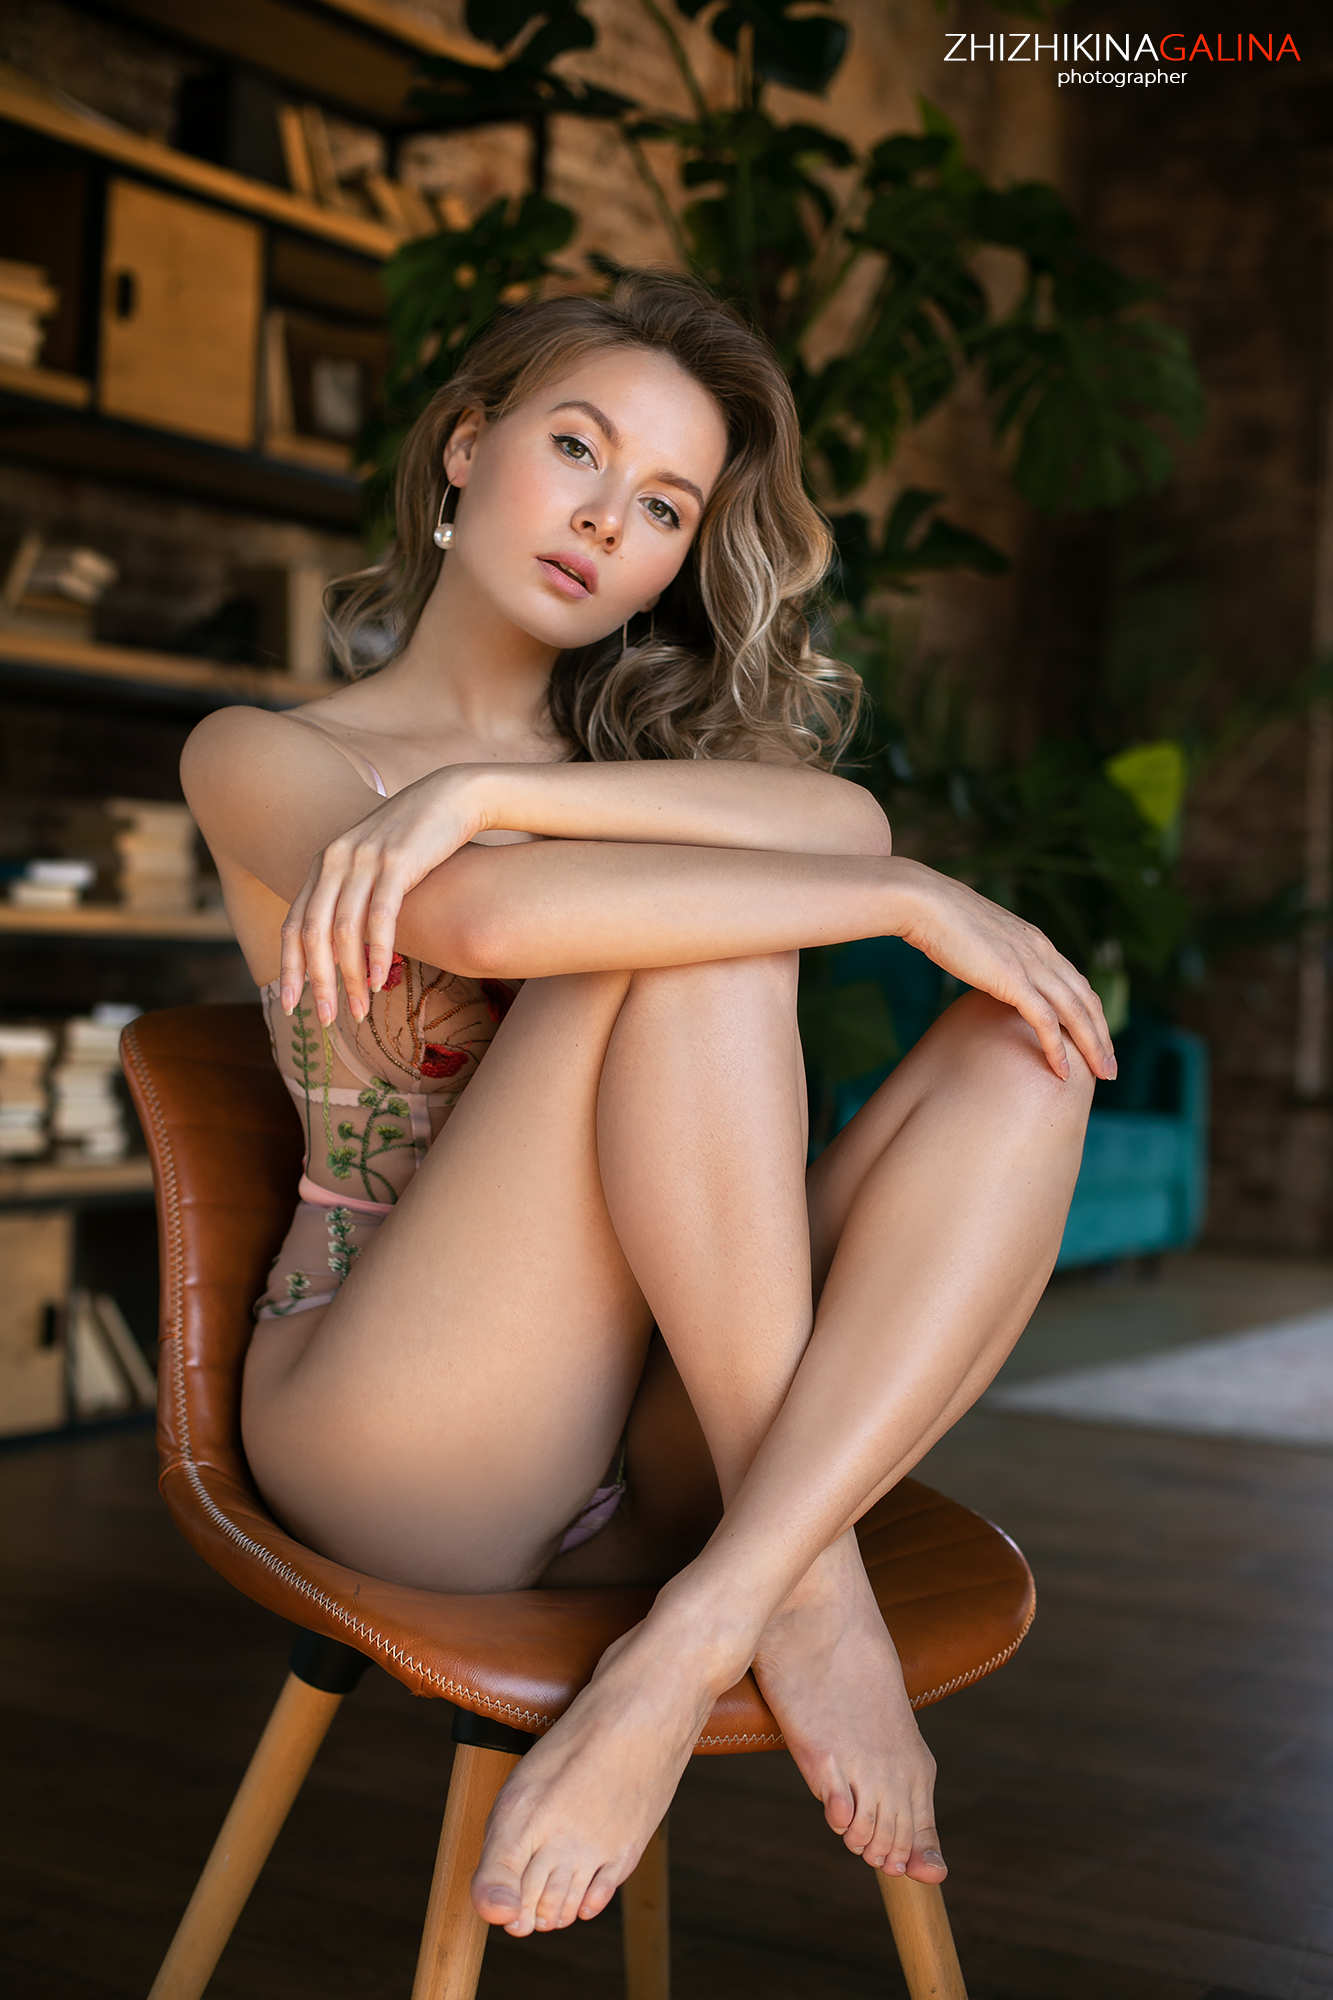 девушка, портрет, лицо, руки, прикосновение, girl, face, portrait, , Галина Жижикина